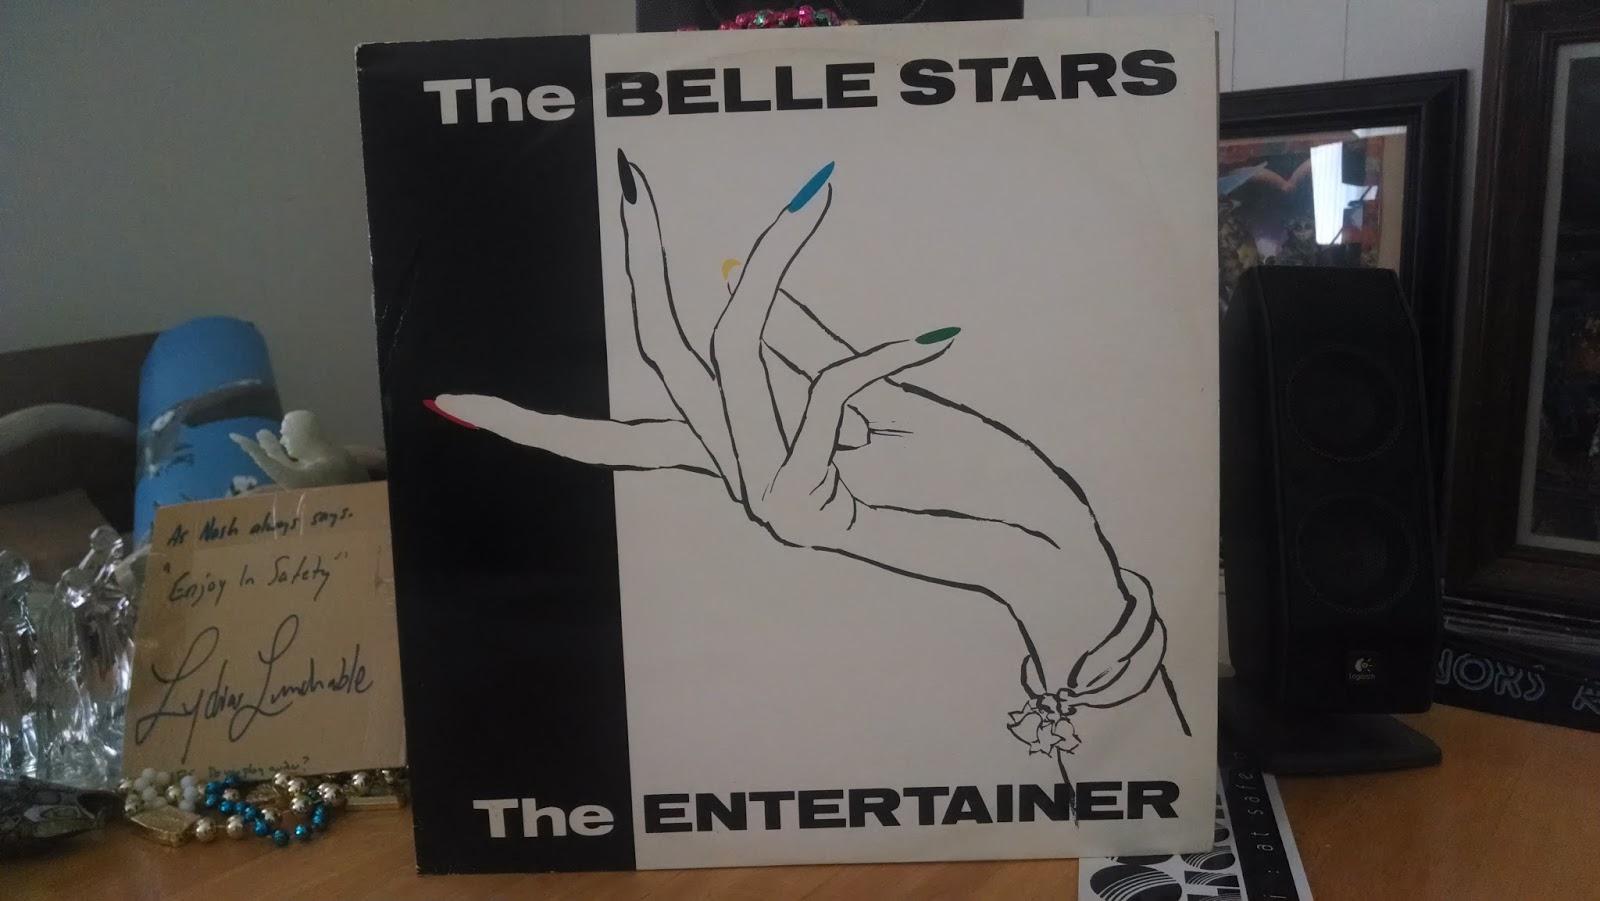 Belle stars world domination